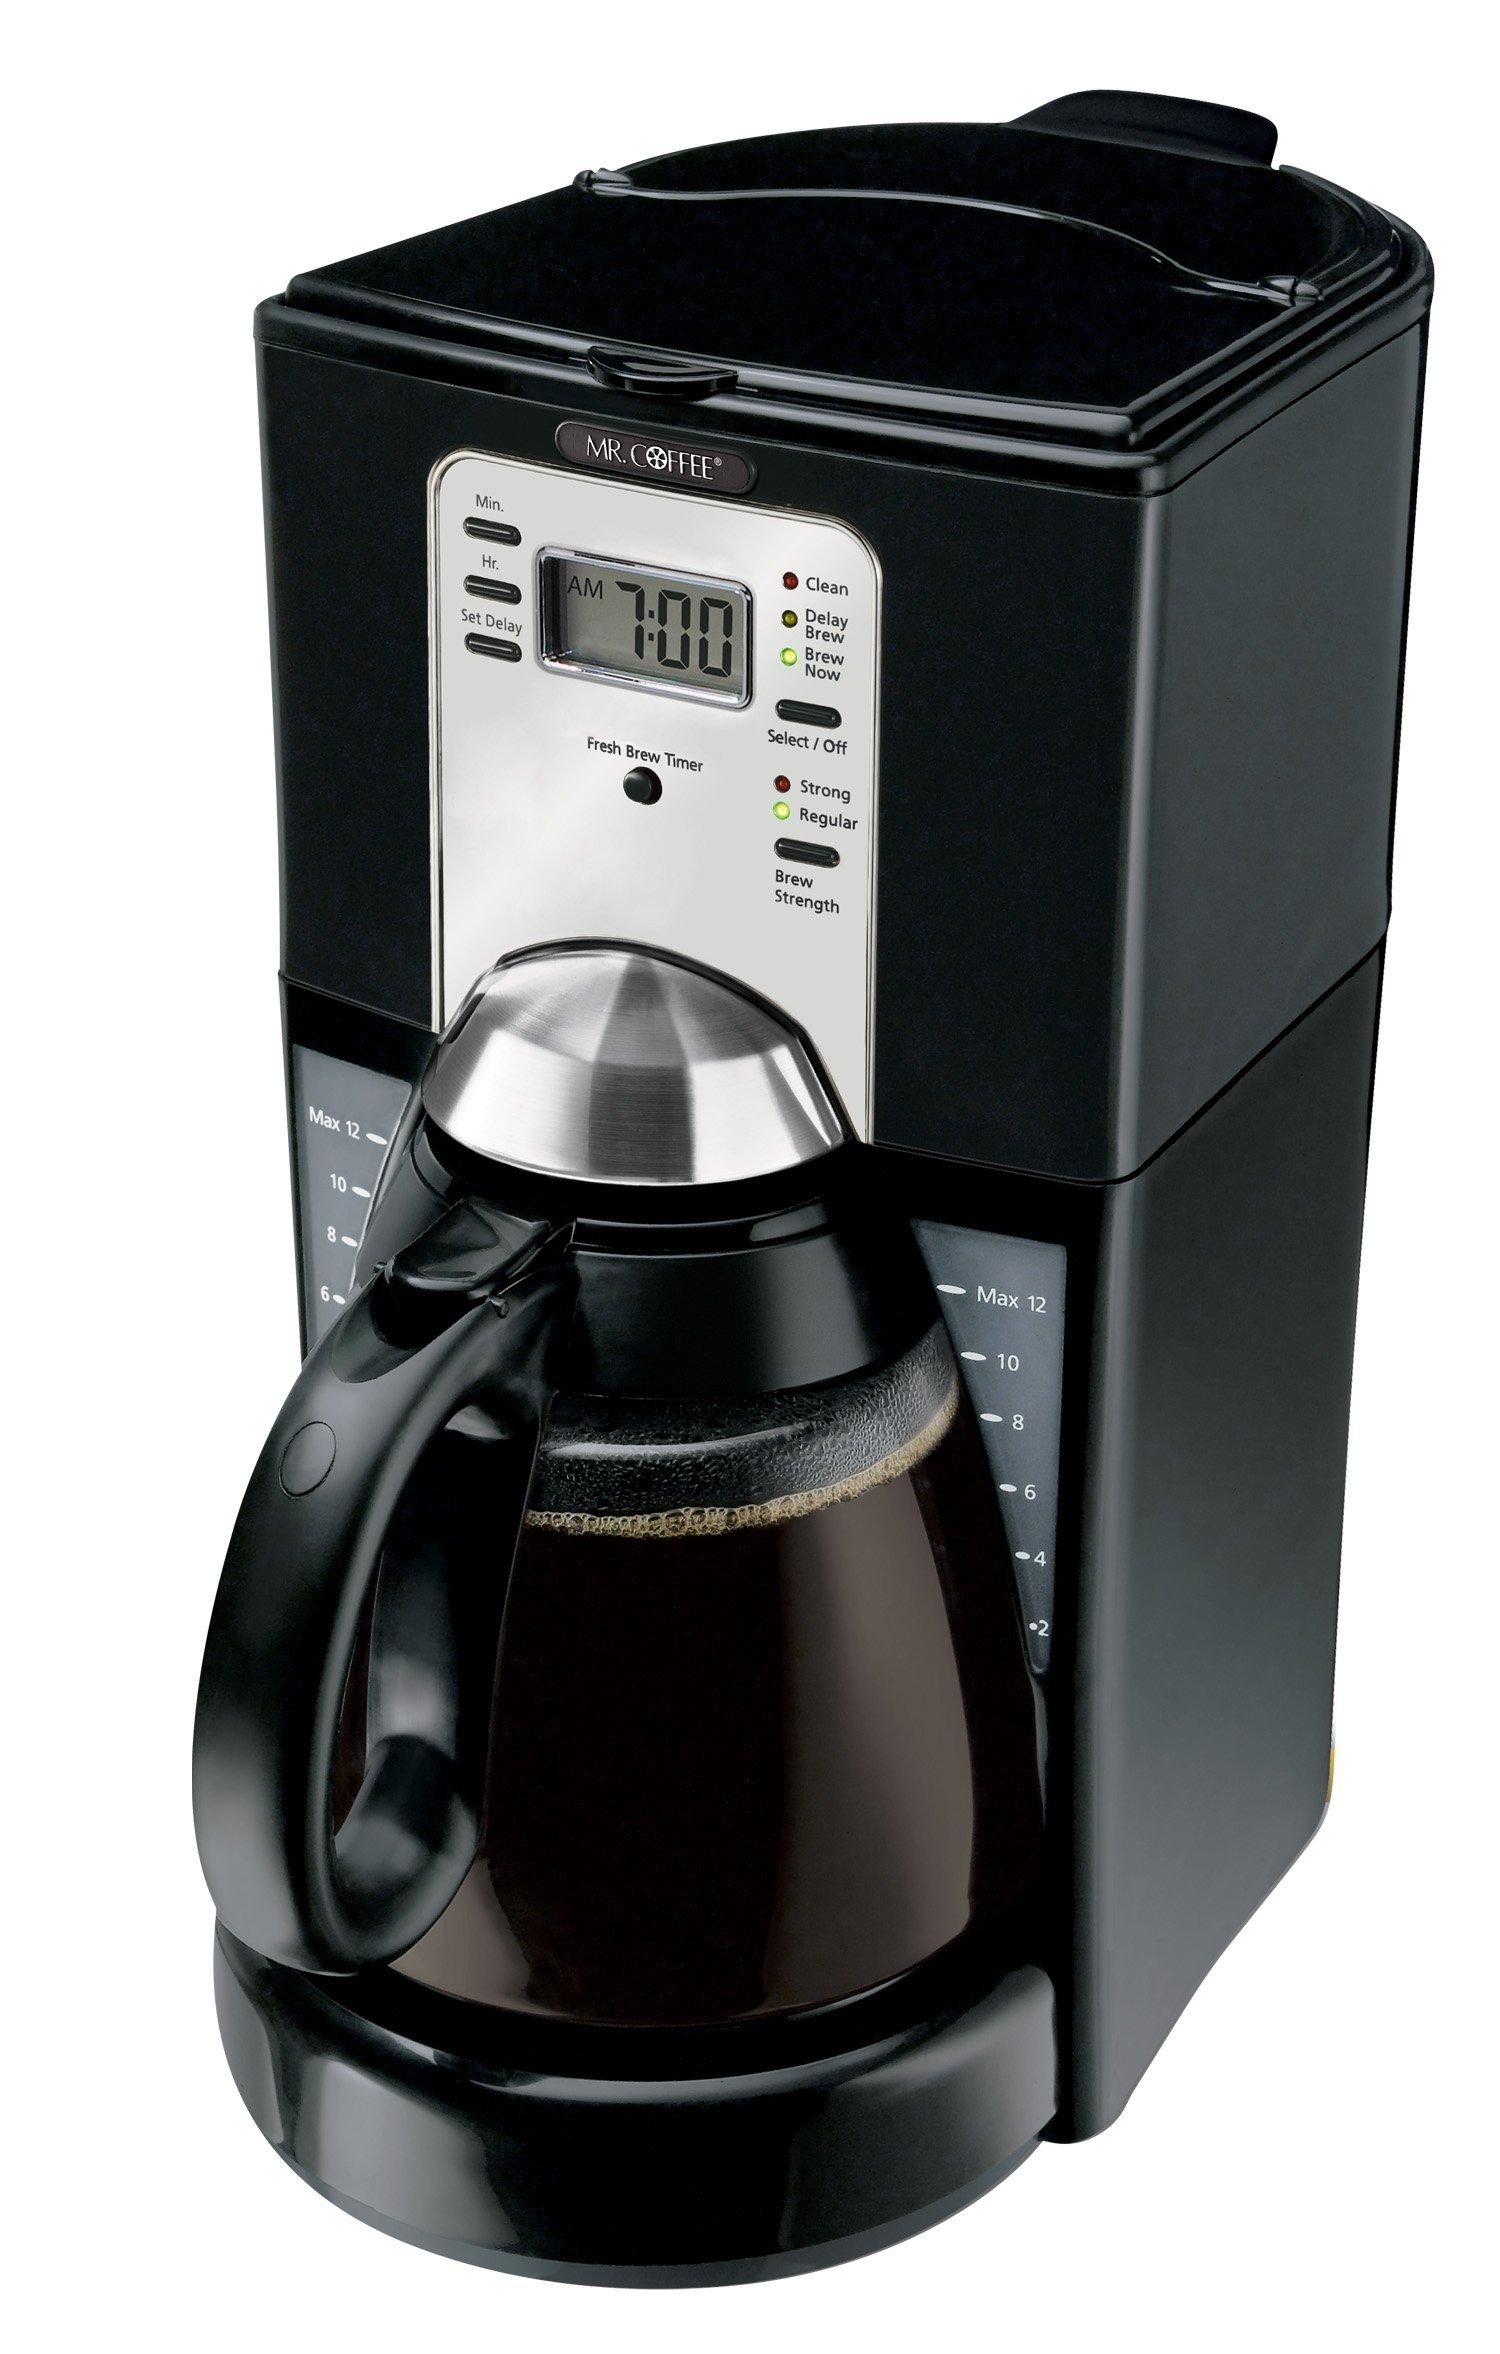 Mr. Coffee FTX43-2 12-Cup Programmable Coffeemaker, Black